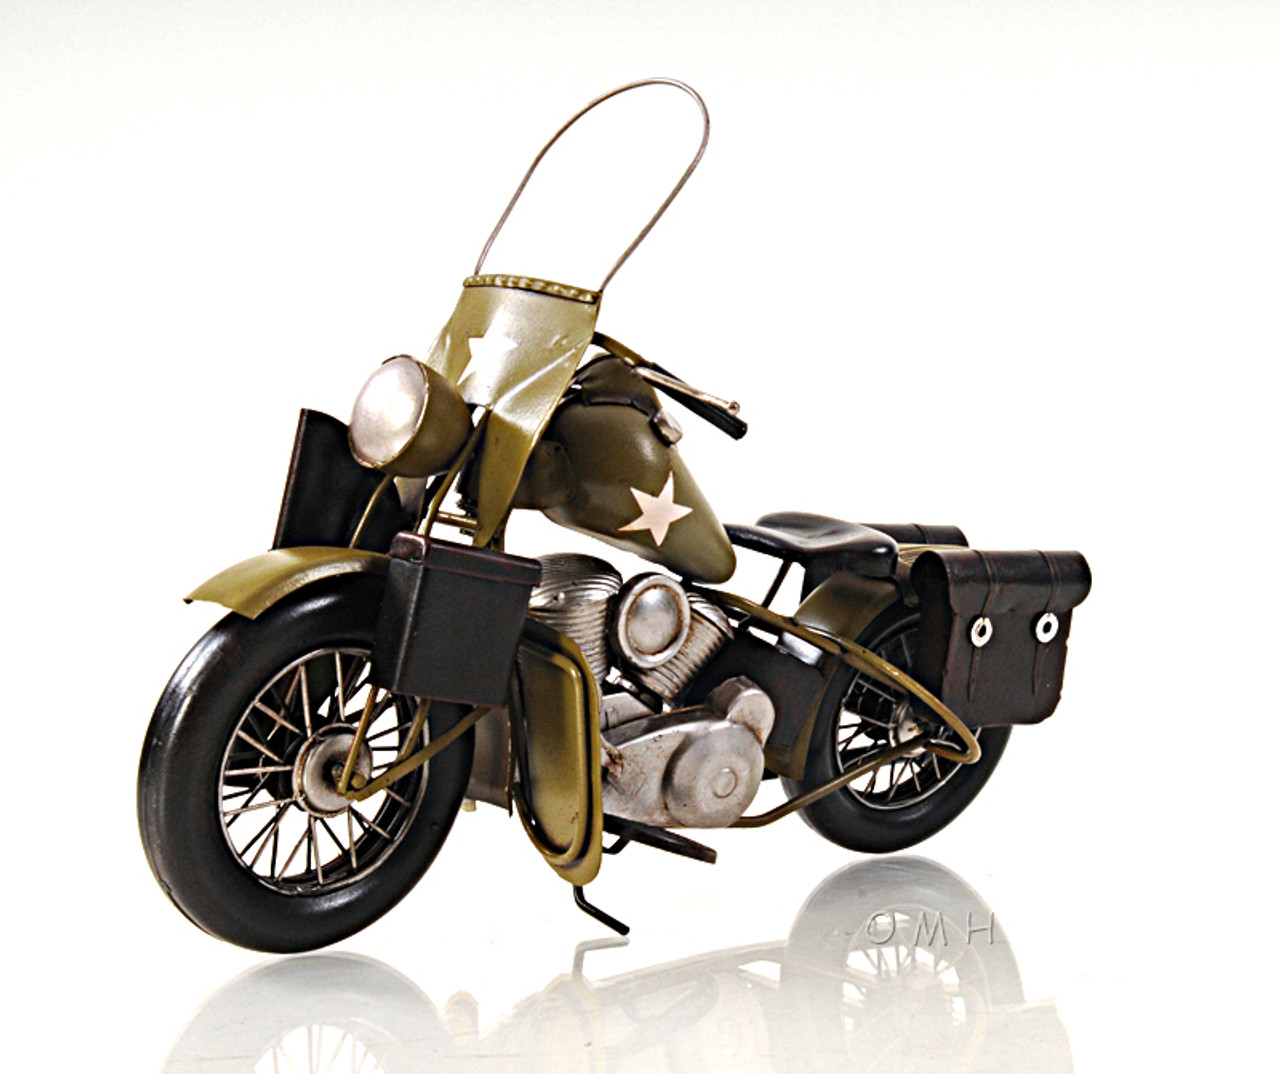 1942 Harley Davidson Military Motorcycle Metal Model